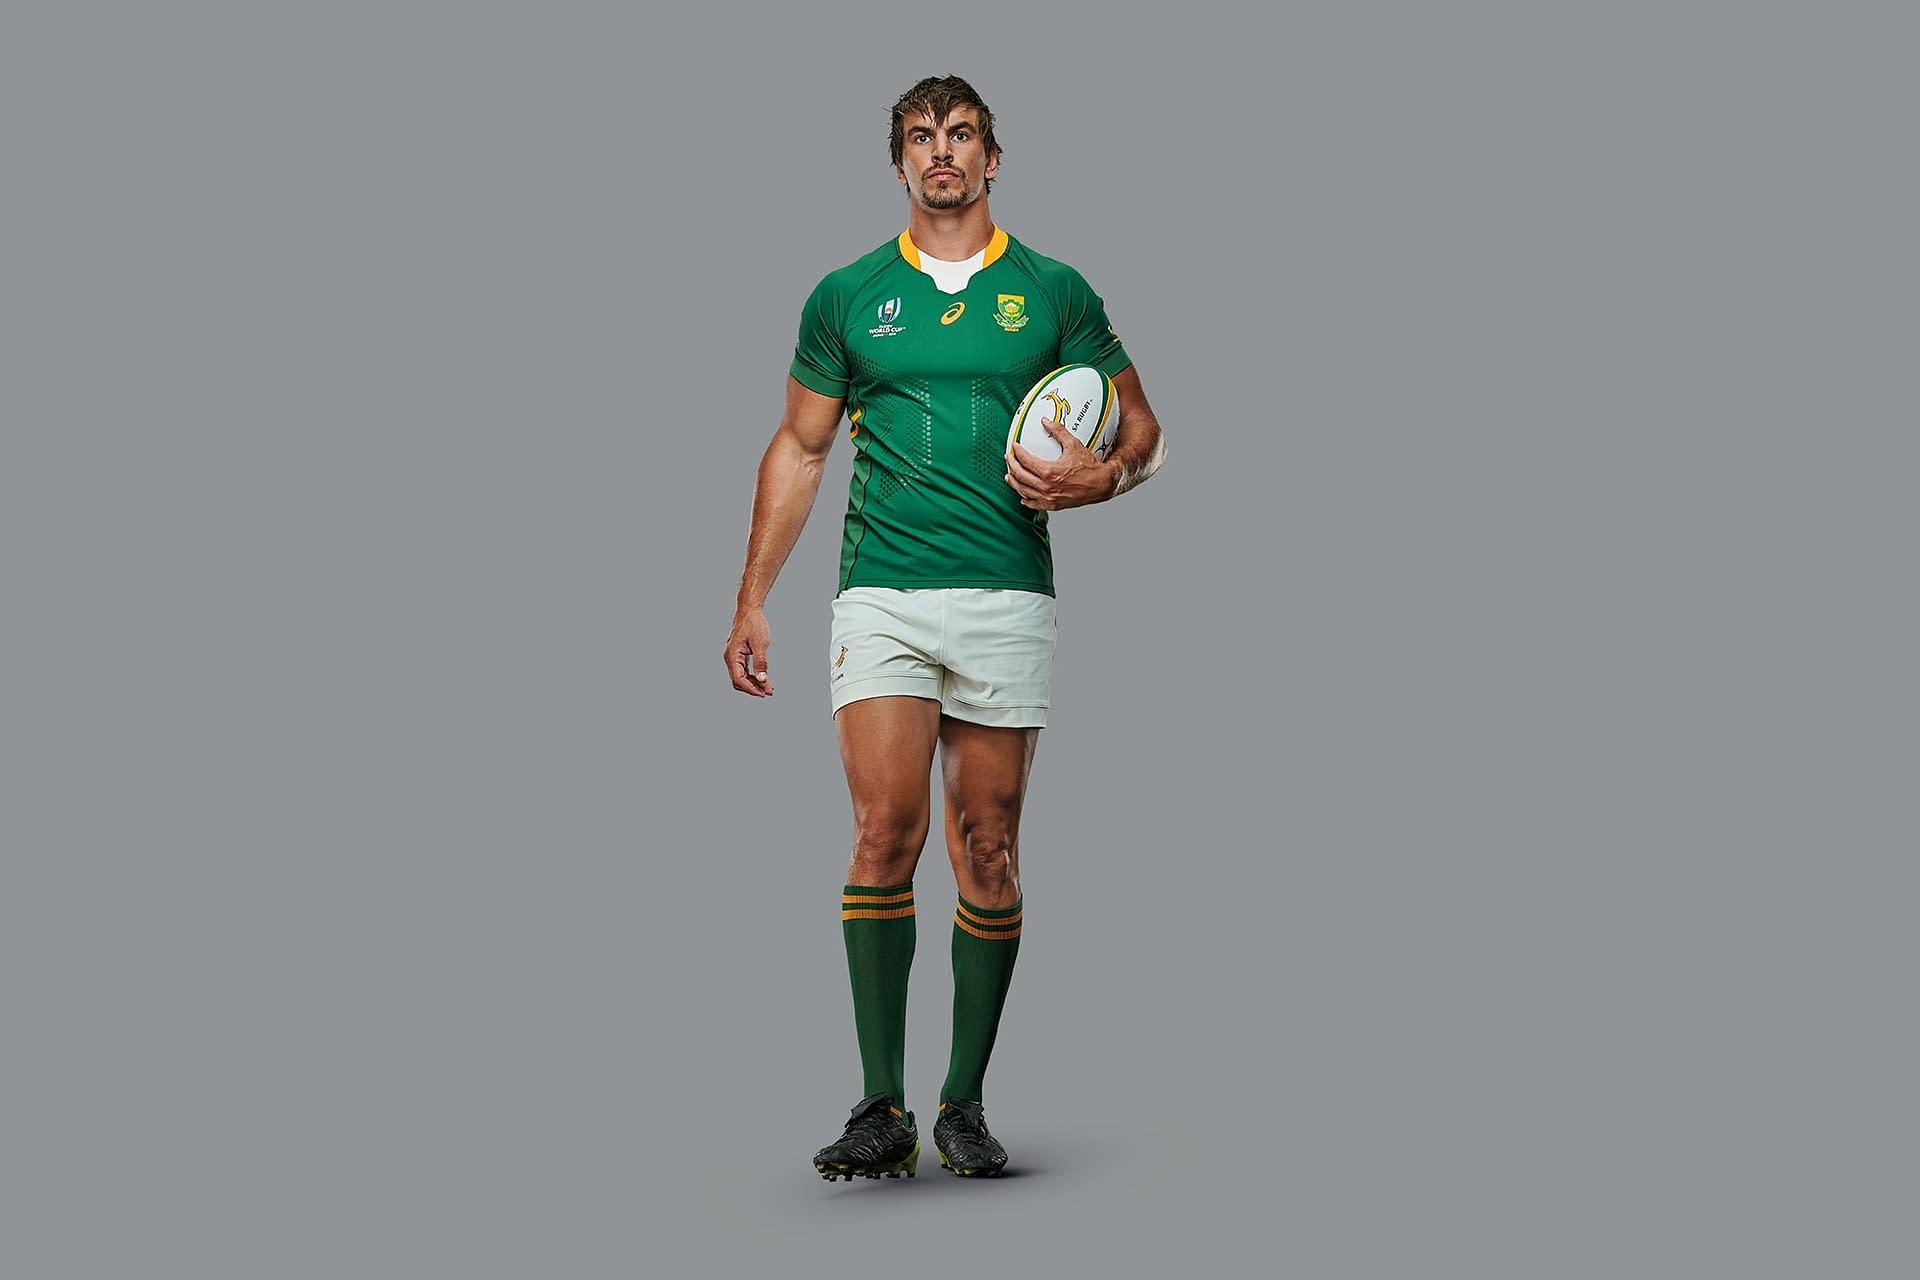 world cup rugby champion eben etzebeth image taken in studio for new asics print campaign